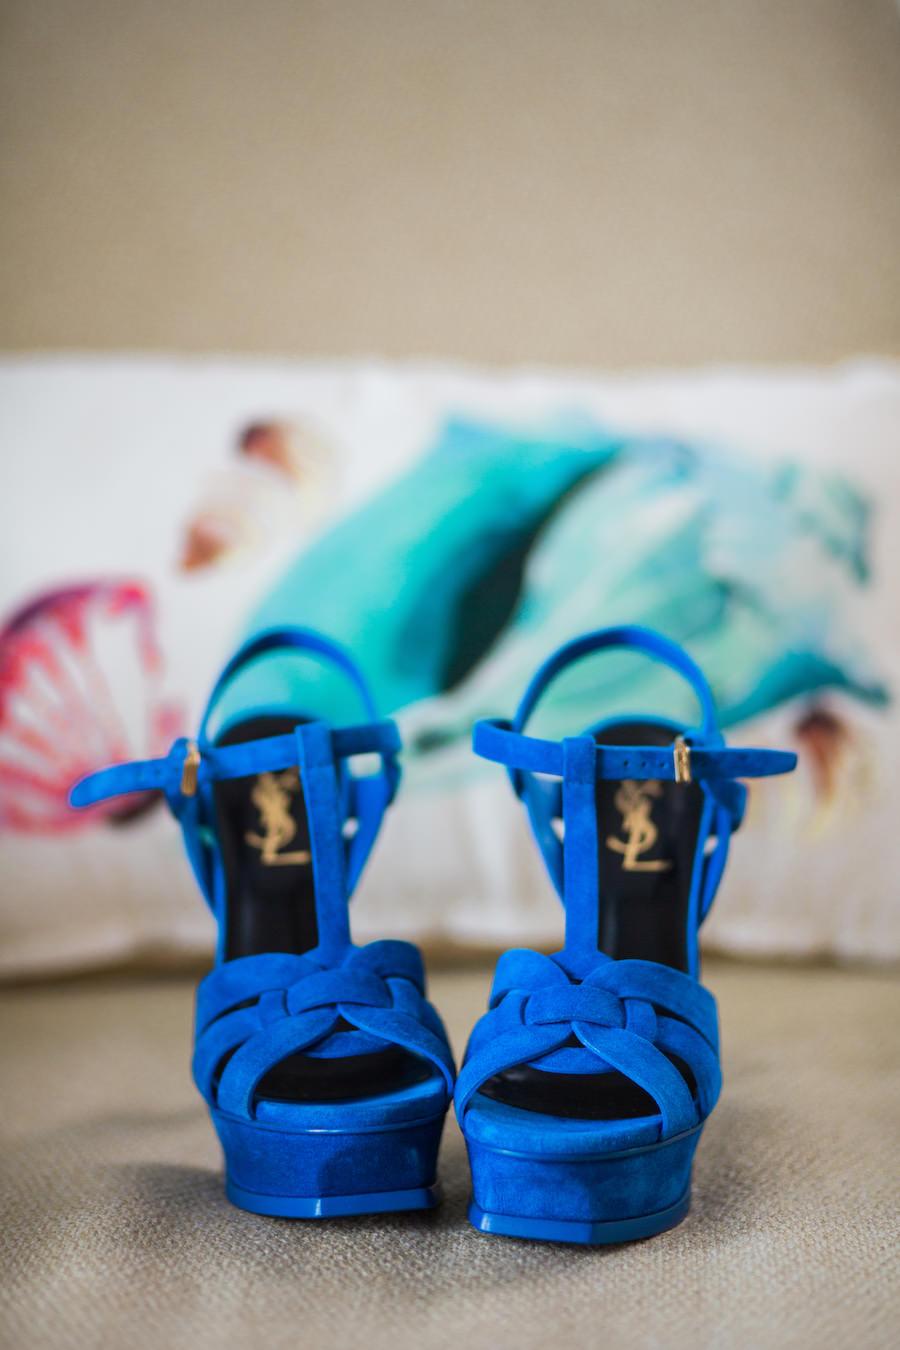 Blue Open Toed YSL Yves Saint Laurent Wedding Shoes